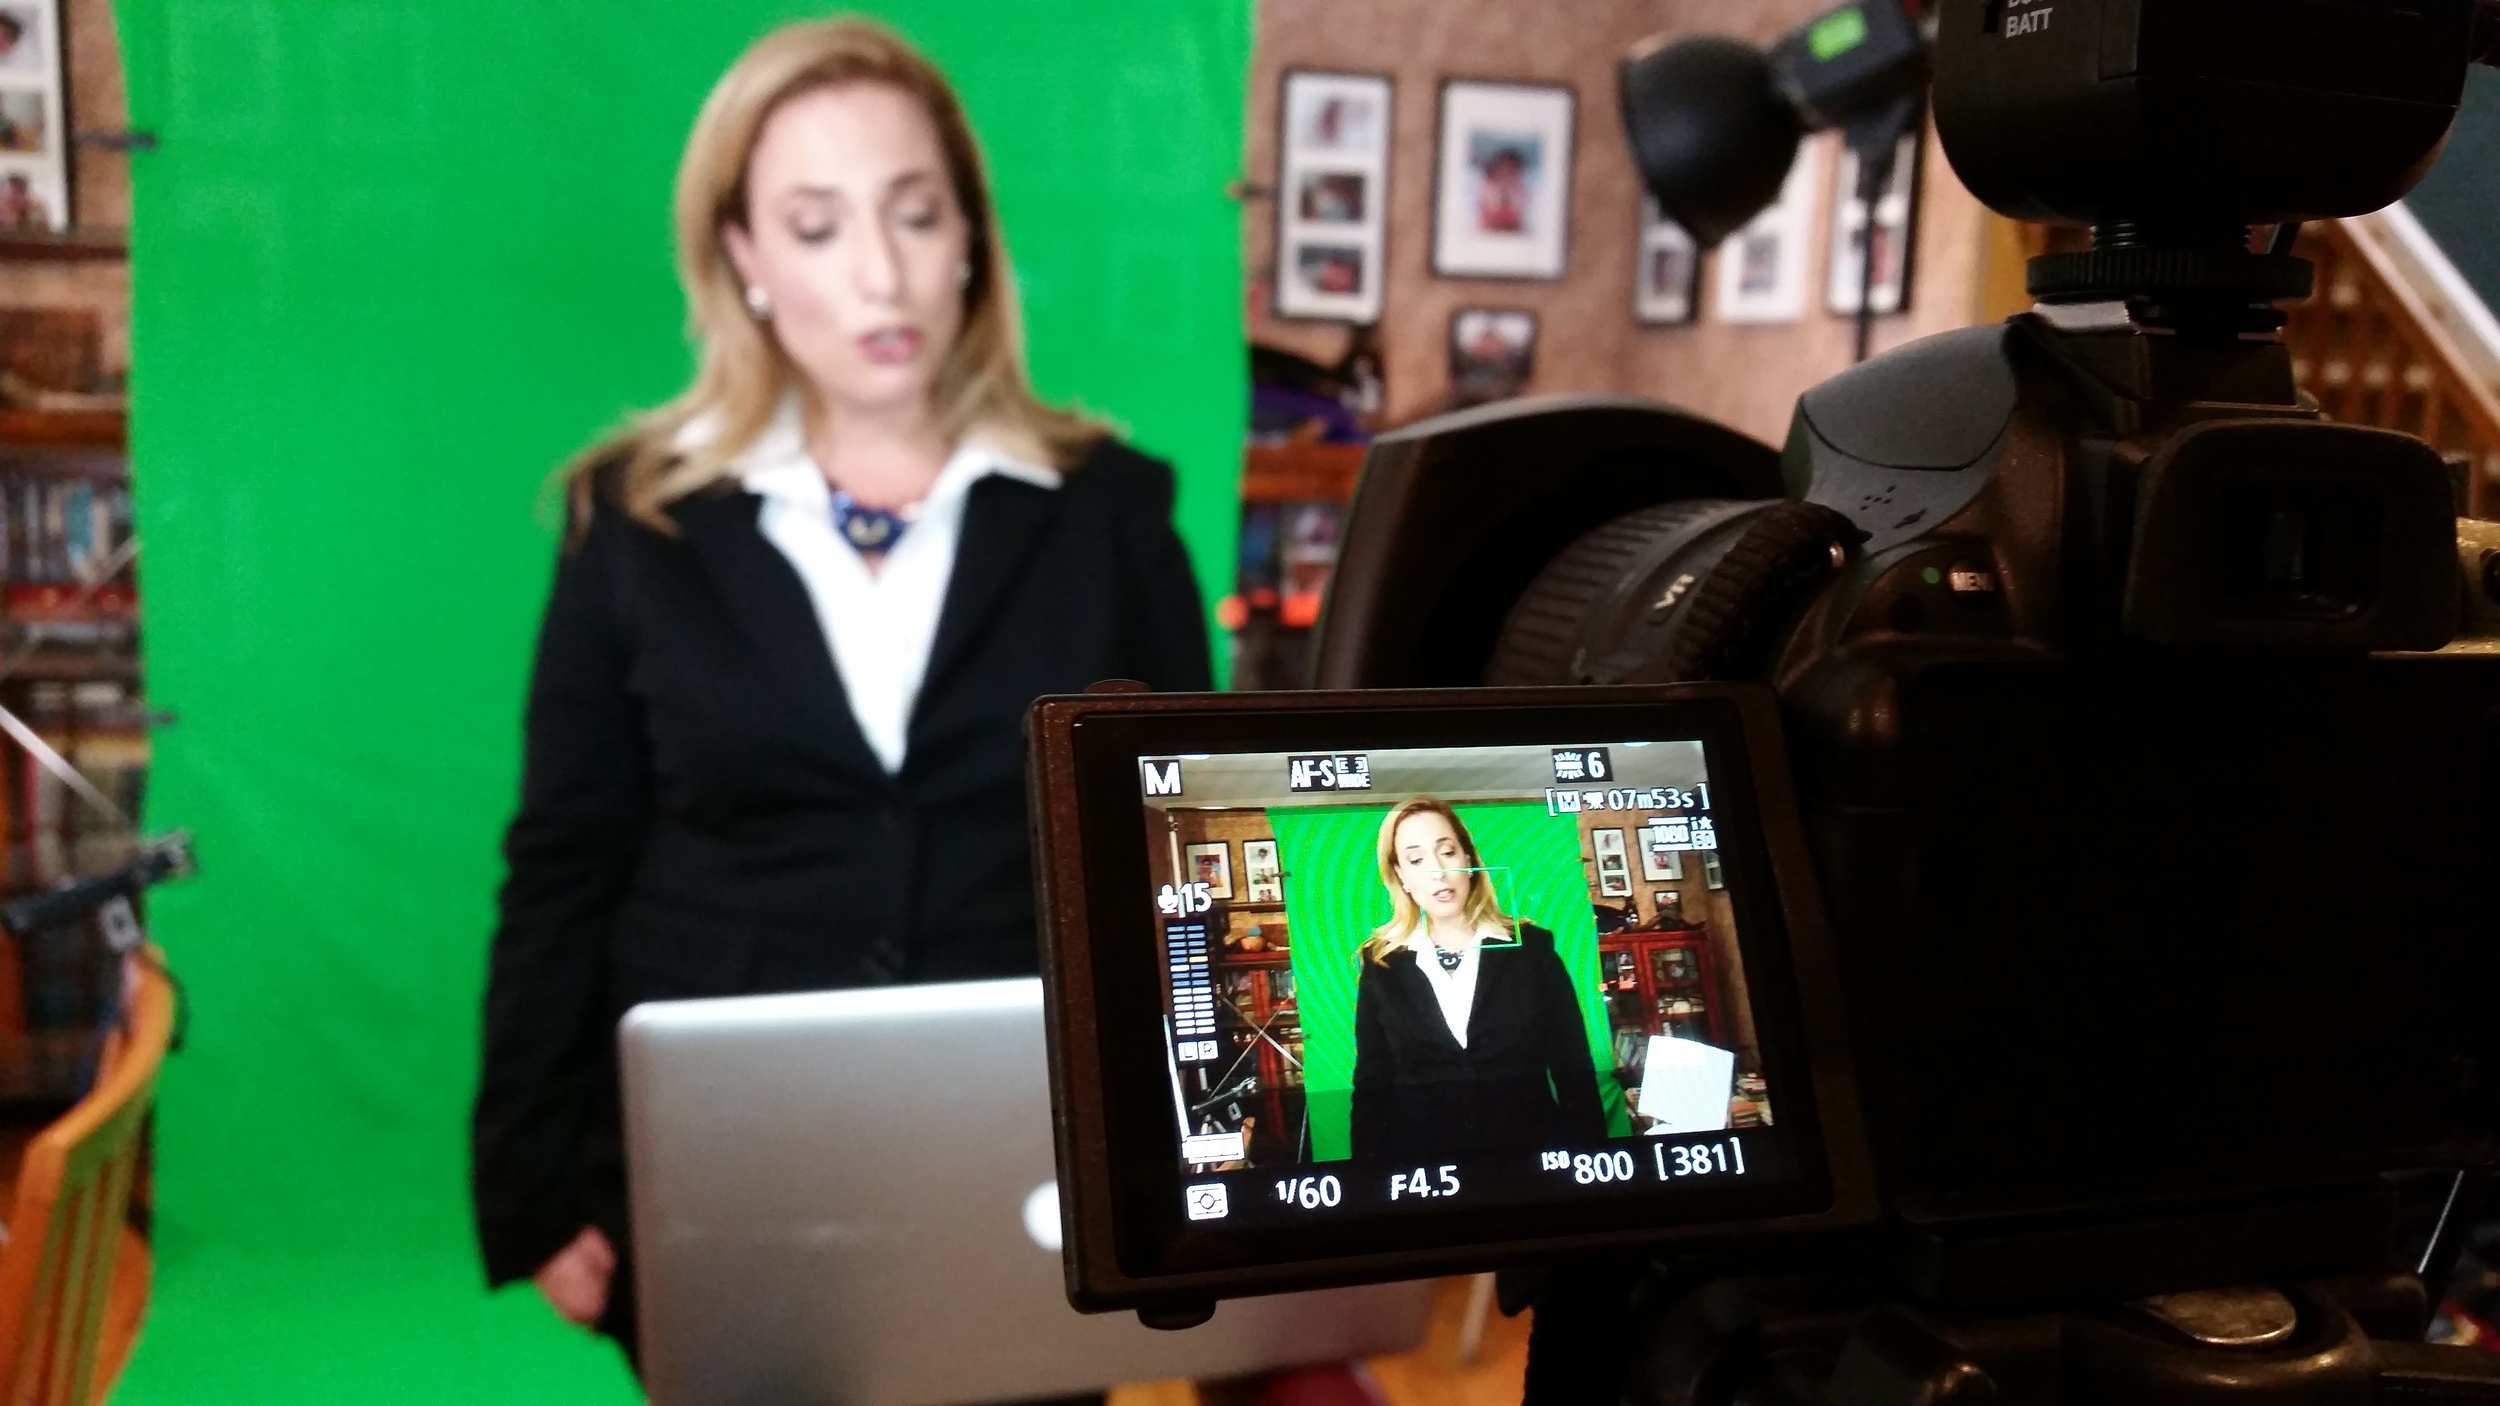 Recording content for an Entrepreneur's online business.